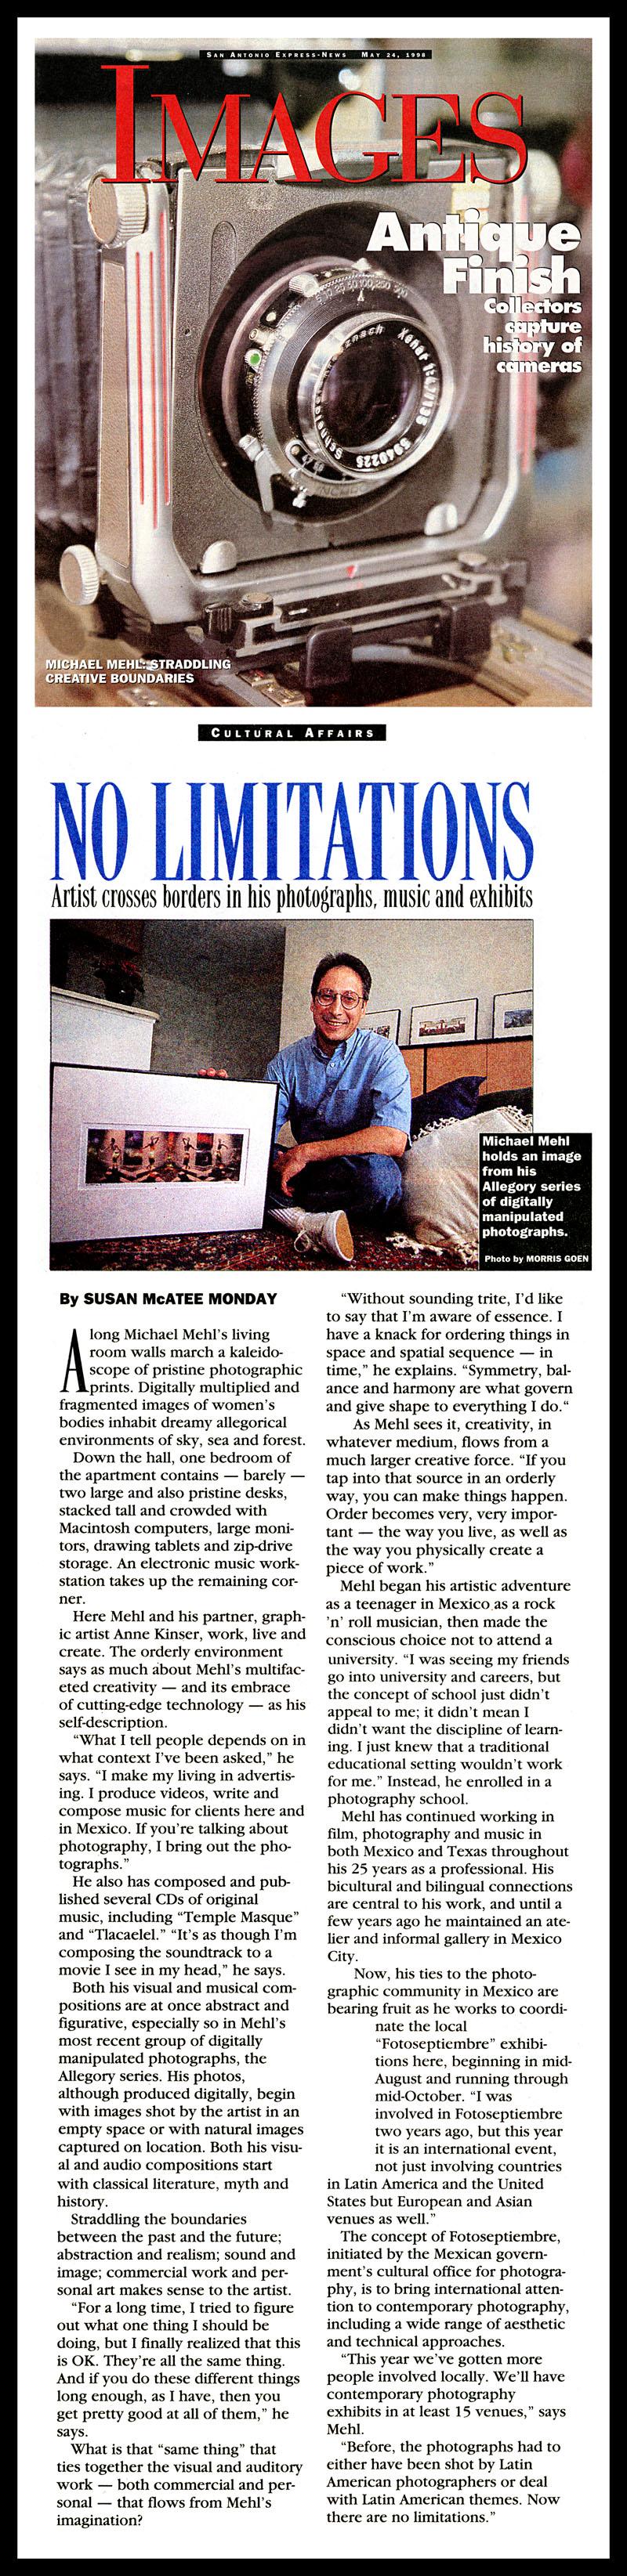 1998_Michael-Mehl_No-Limitations_San-Antonio-Express-News-Images-Magazine